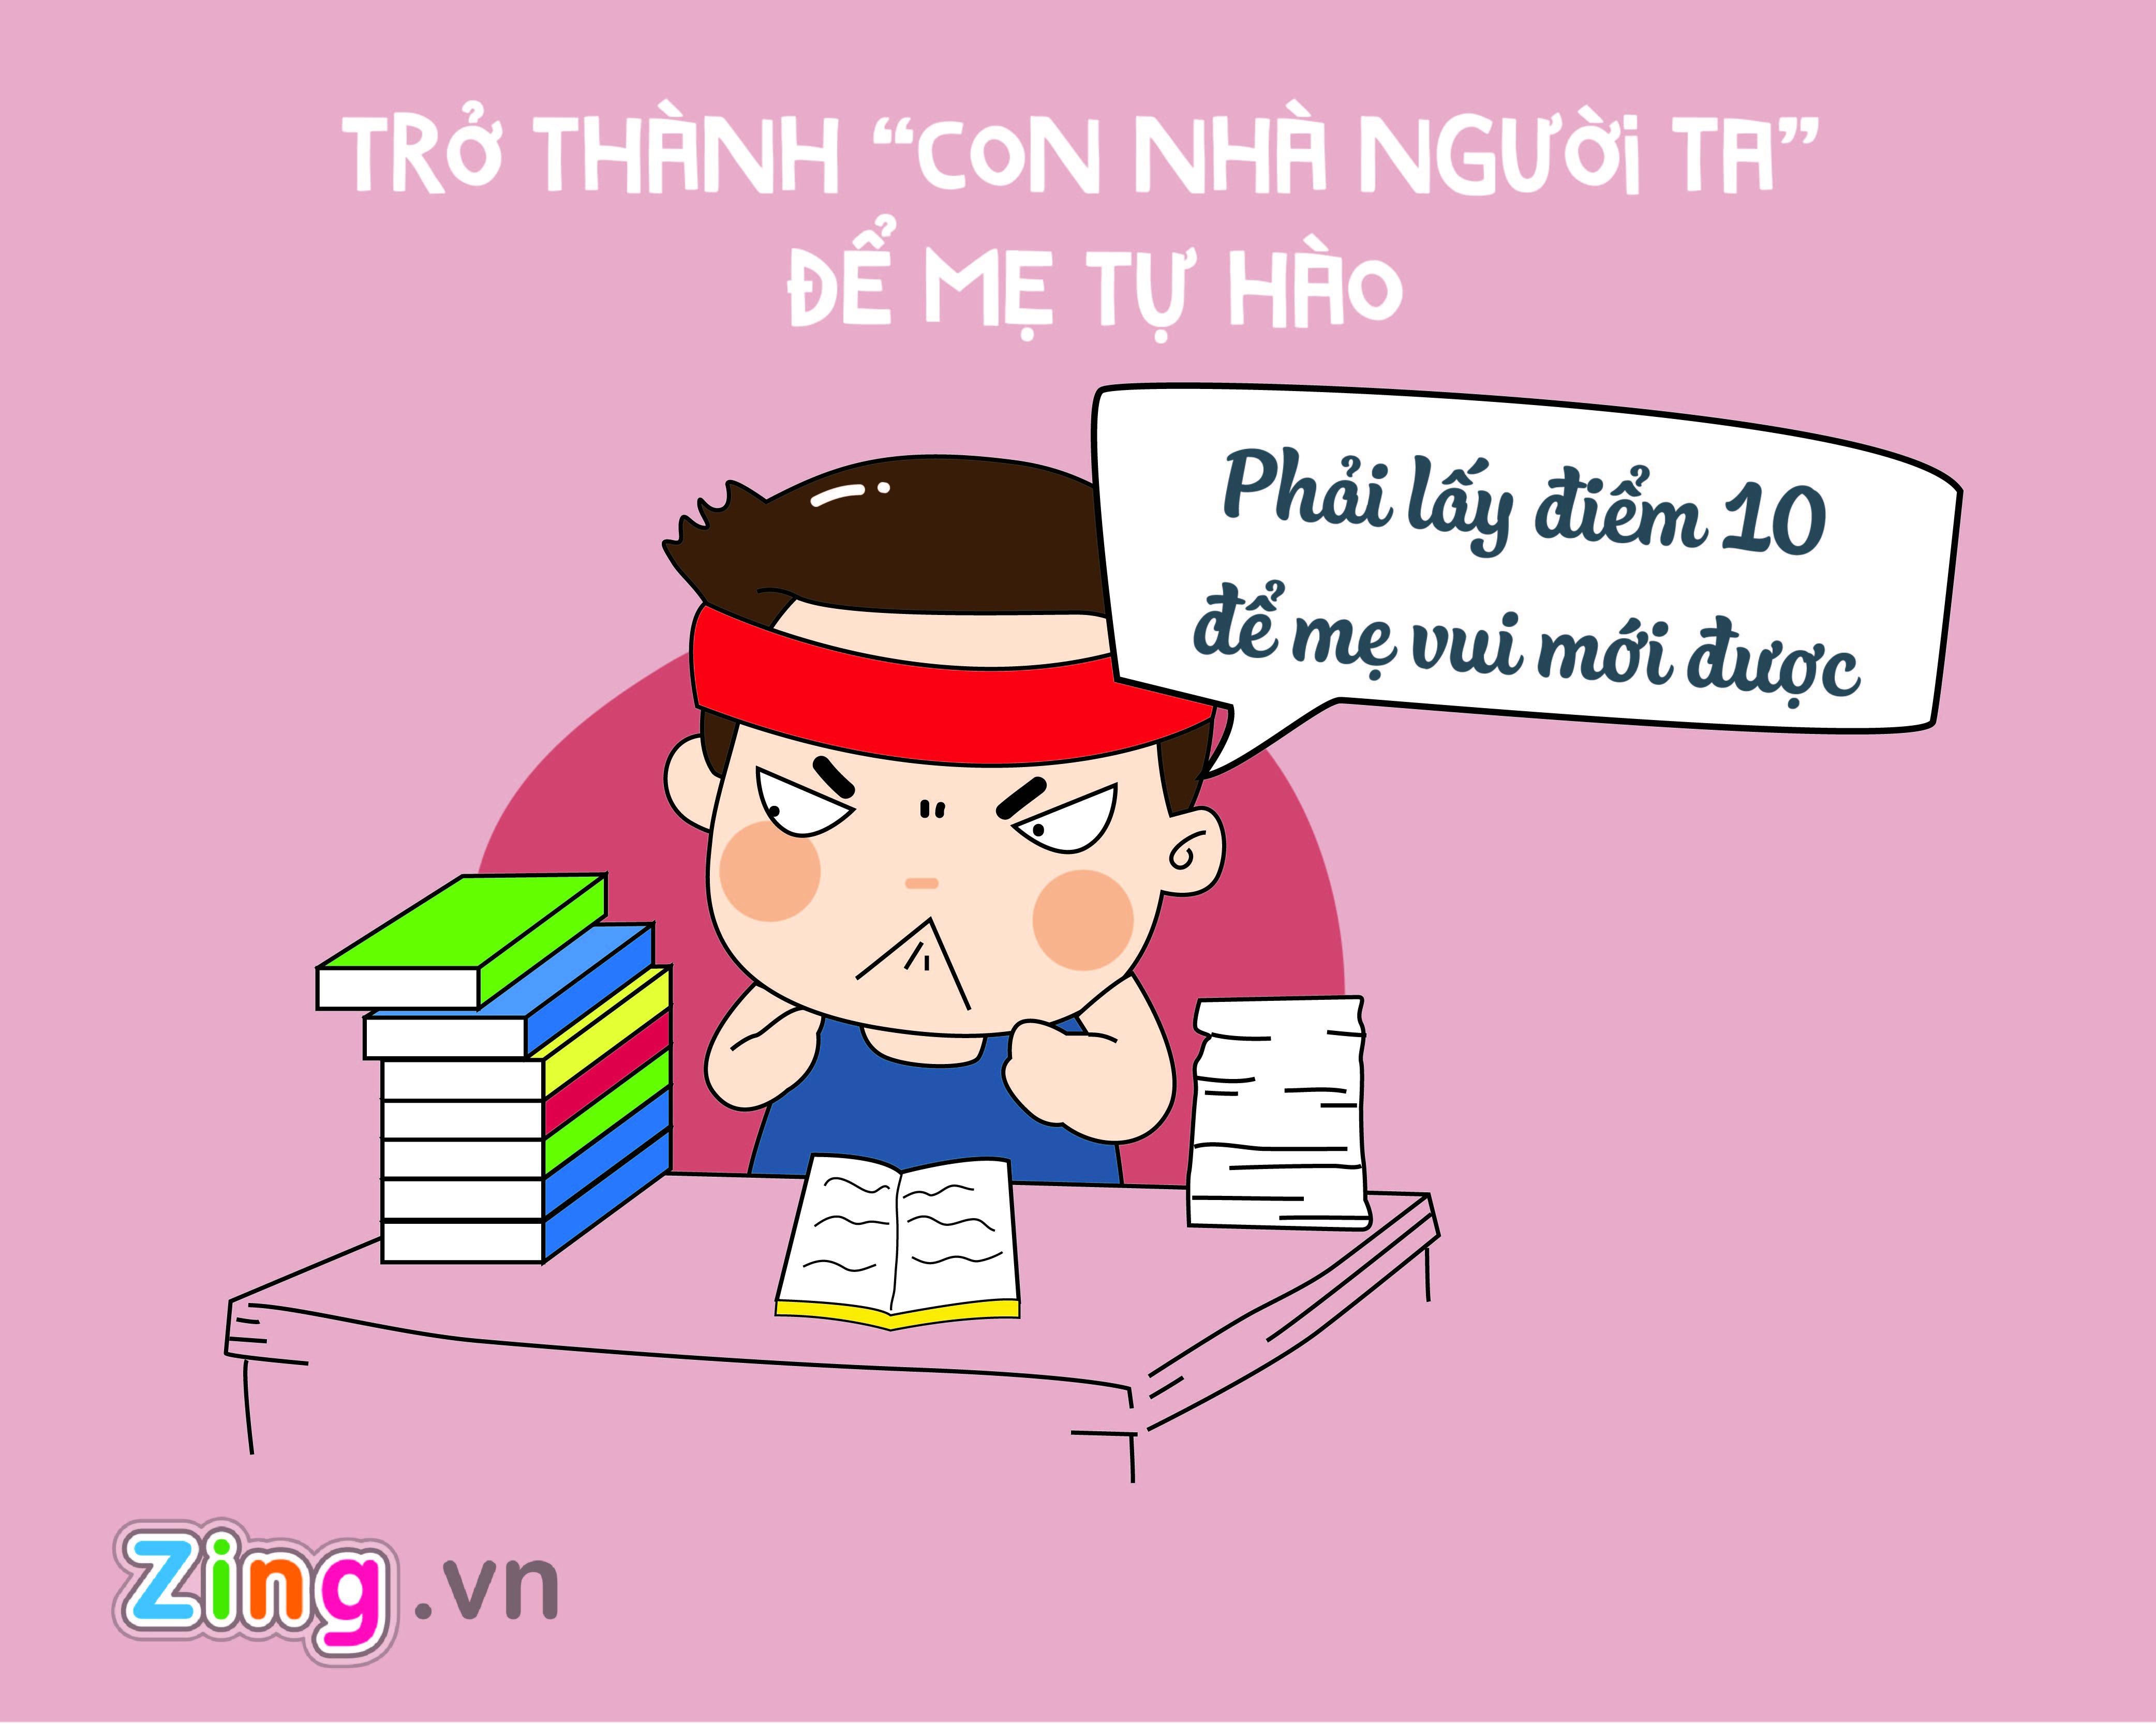 Dung Chi Noi Yeu, Hay Lam Nhung Dieu Khien Me Thuc Su Hanh Phuc Hinh